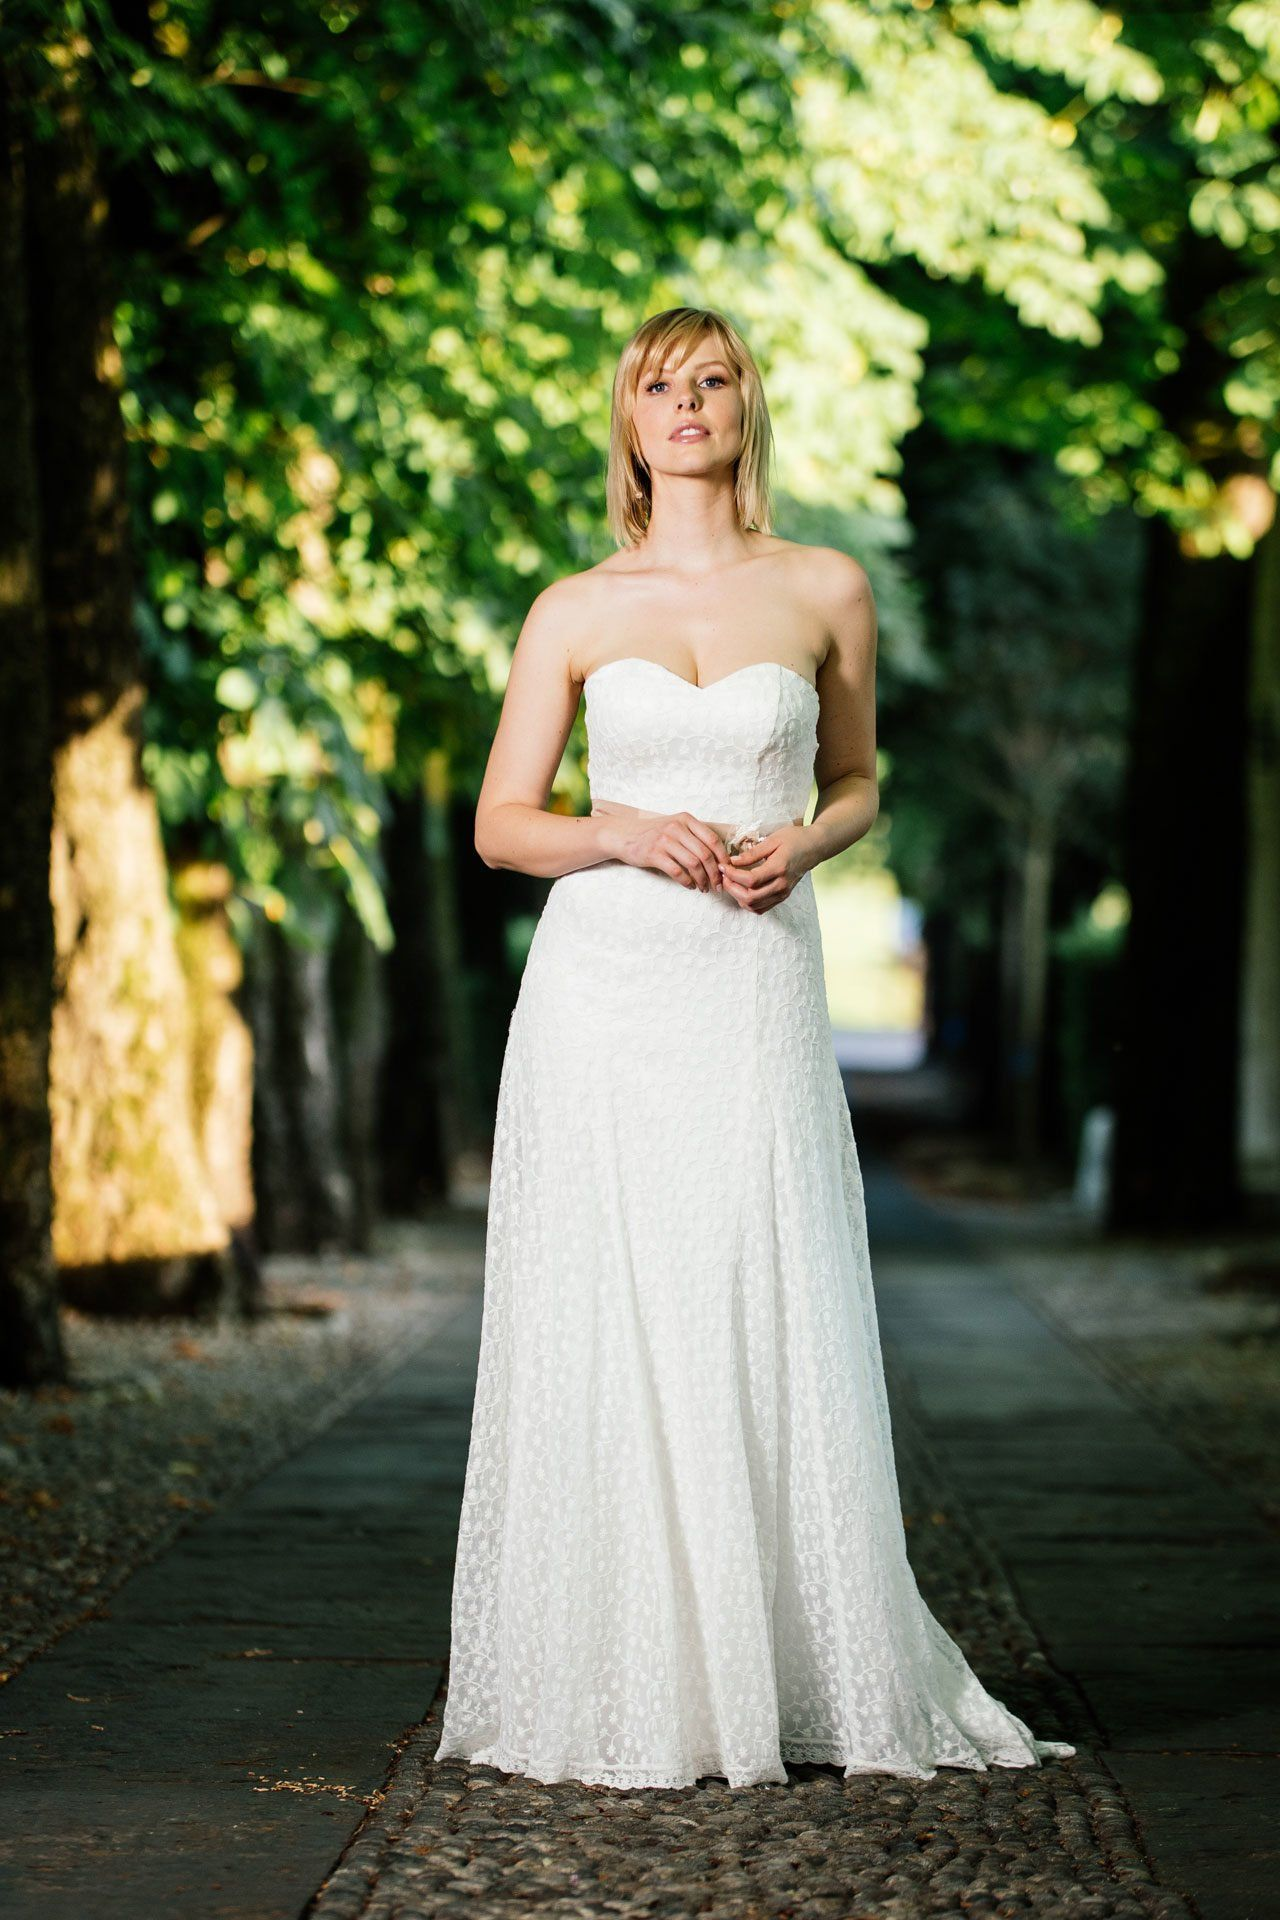 Berühmt Brautkleid Mieten Leeds Fotos - Brautkleider Ideen ...